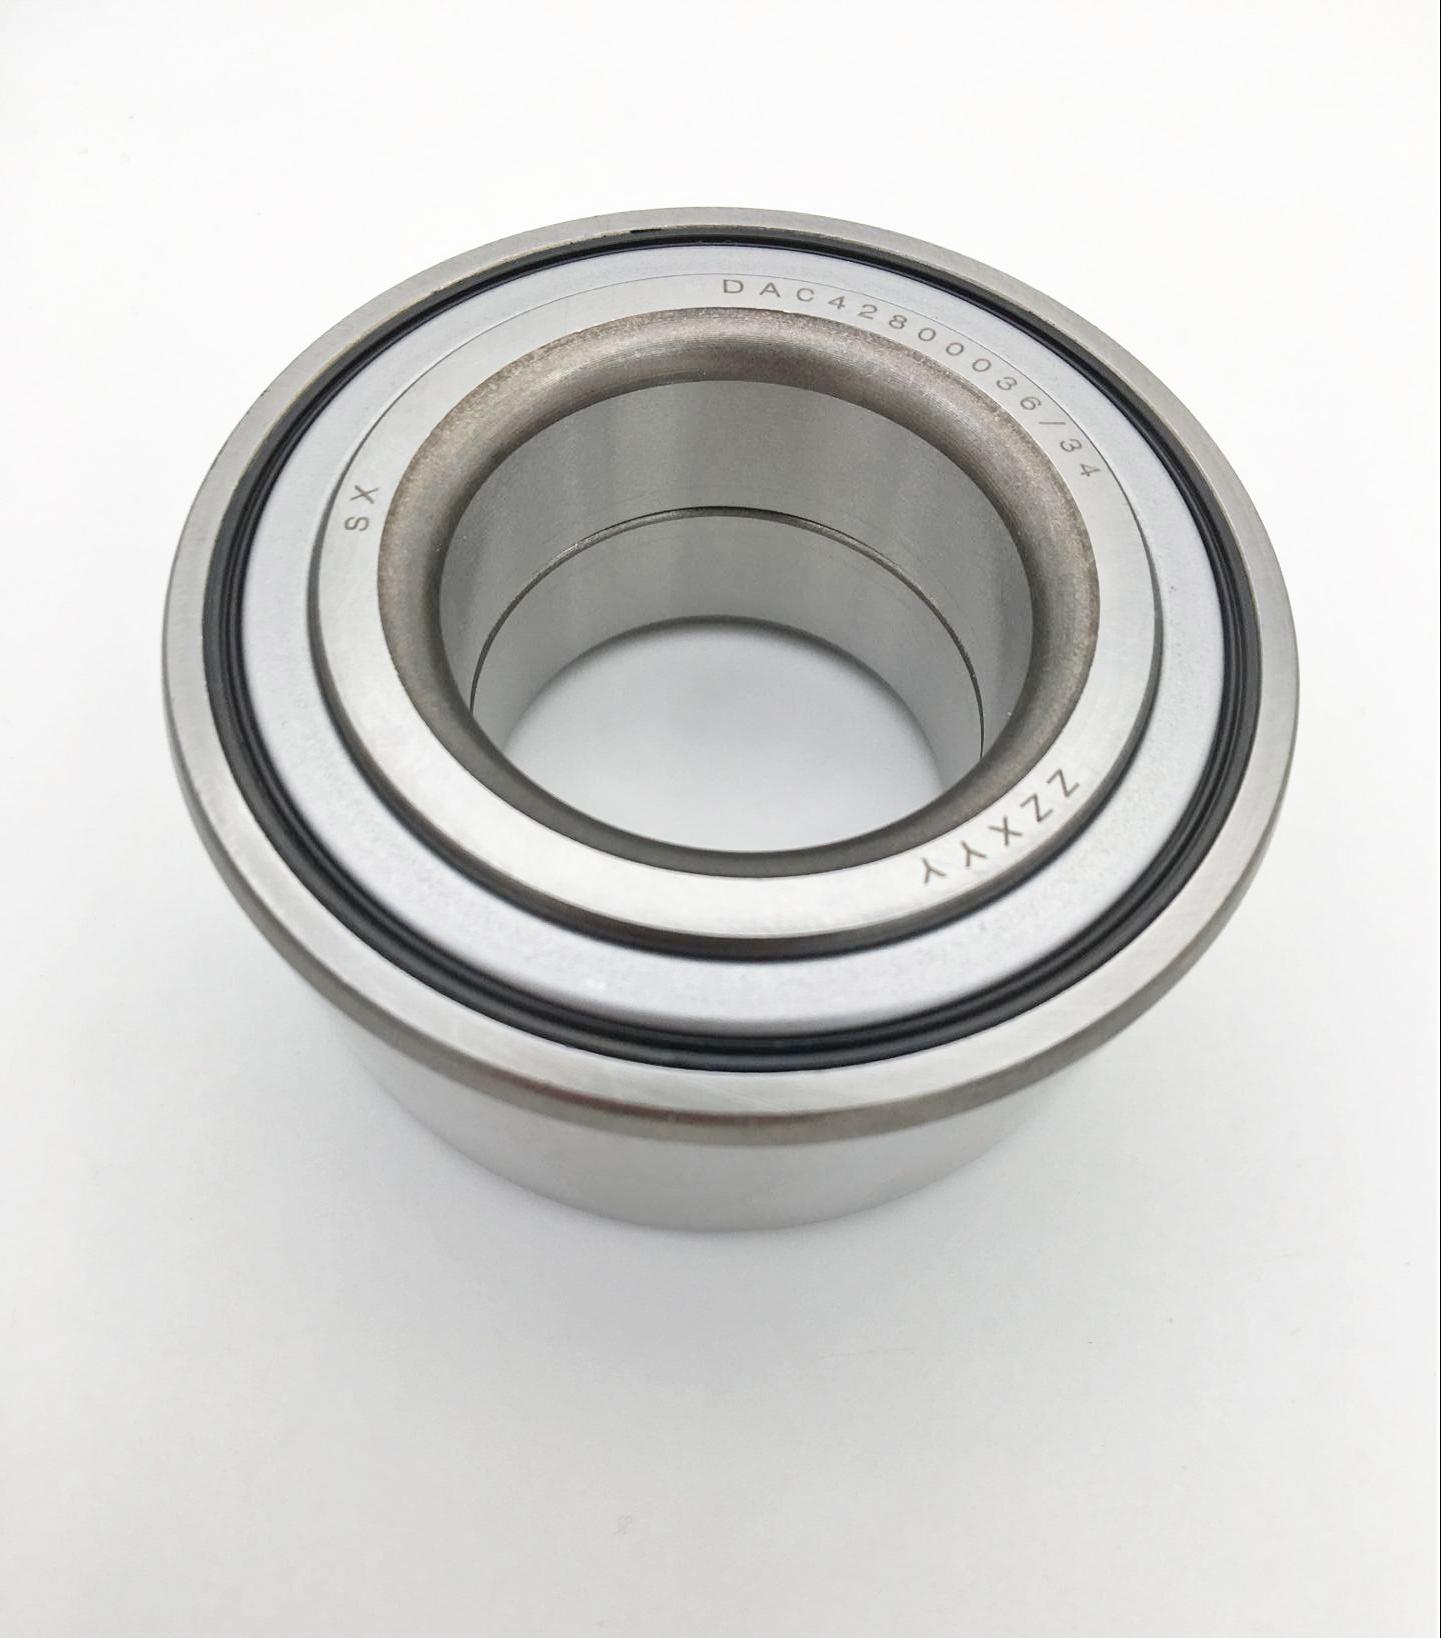 DAC42800036/34汽车轮毂轴承